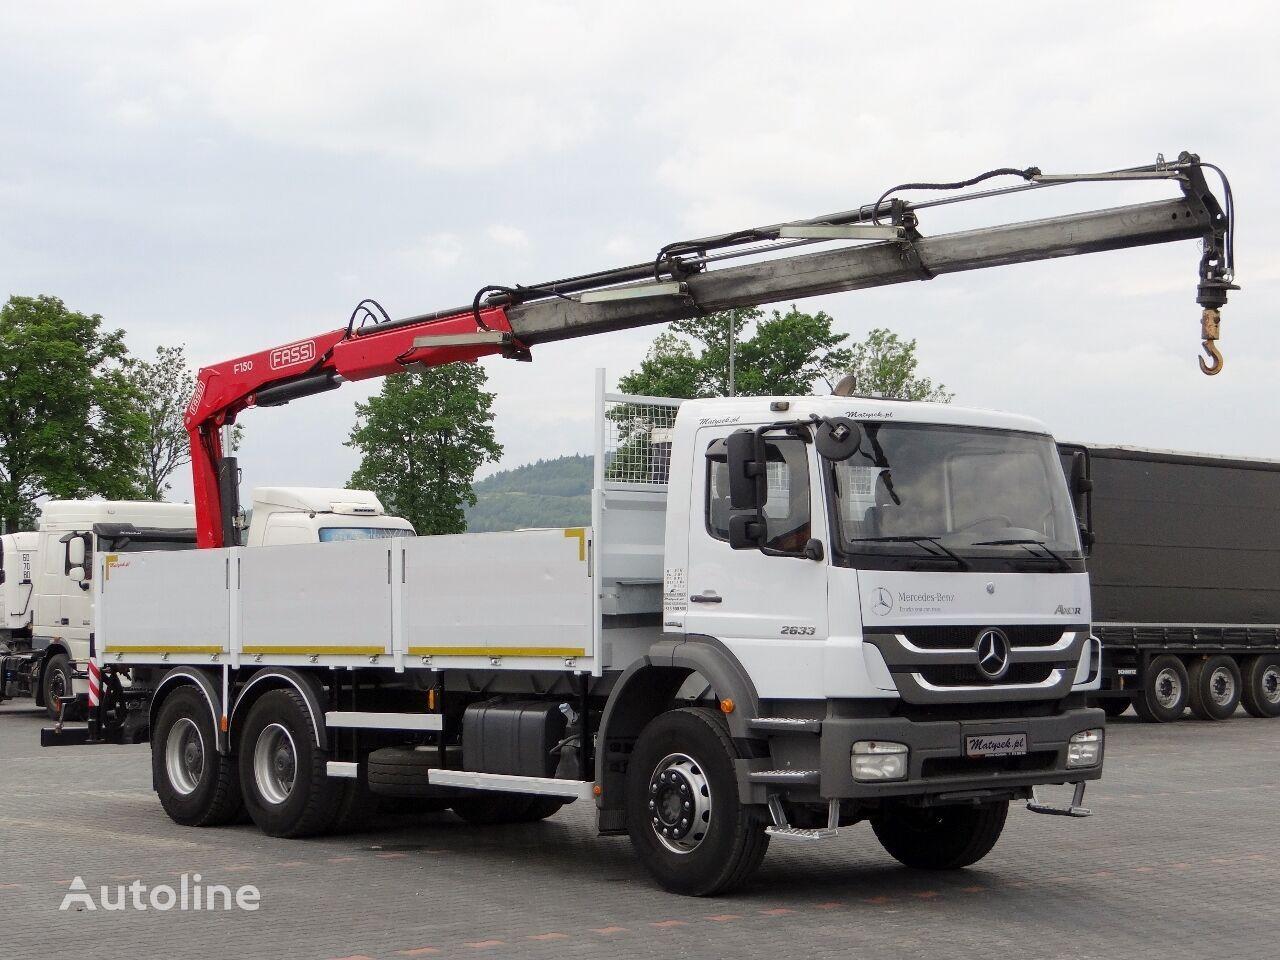 MERCEDES-BENZ AXOR 2633 / 6X4 / MACARA FASSI F150 /RADIO CONTROL / ROTATOR / flatbed truck